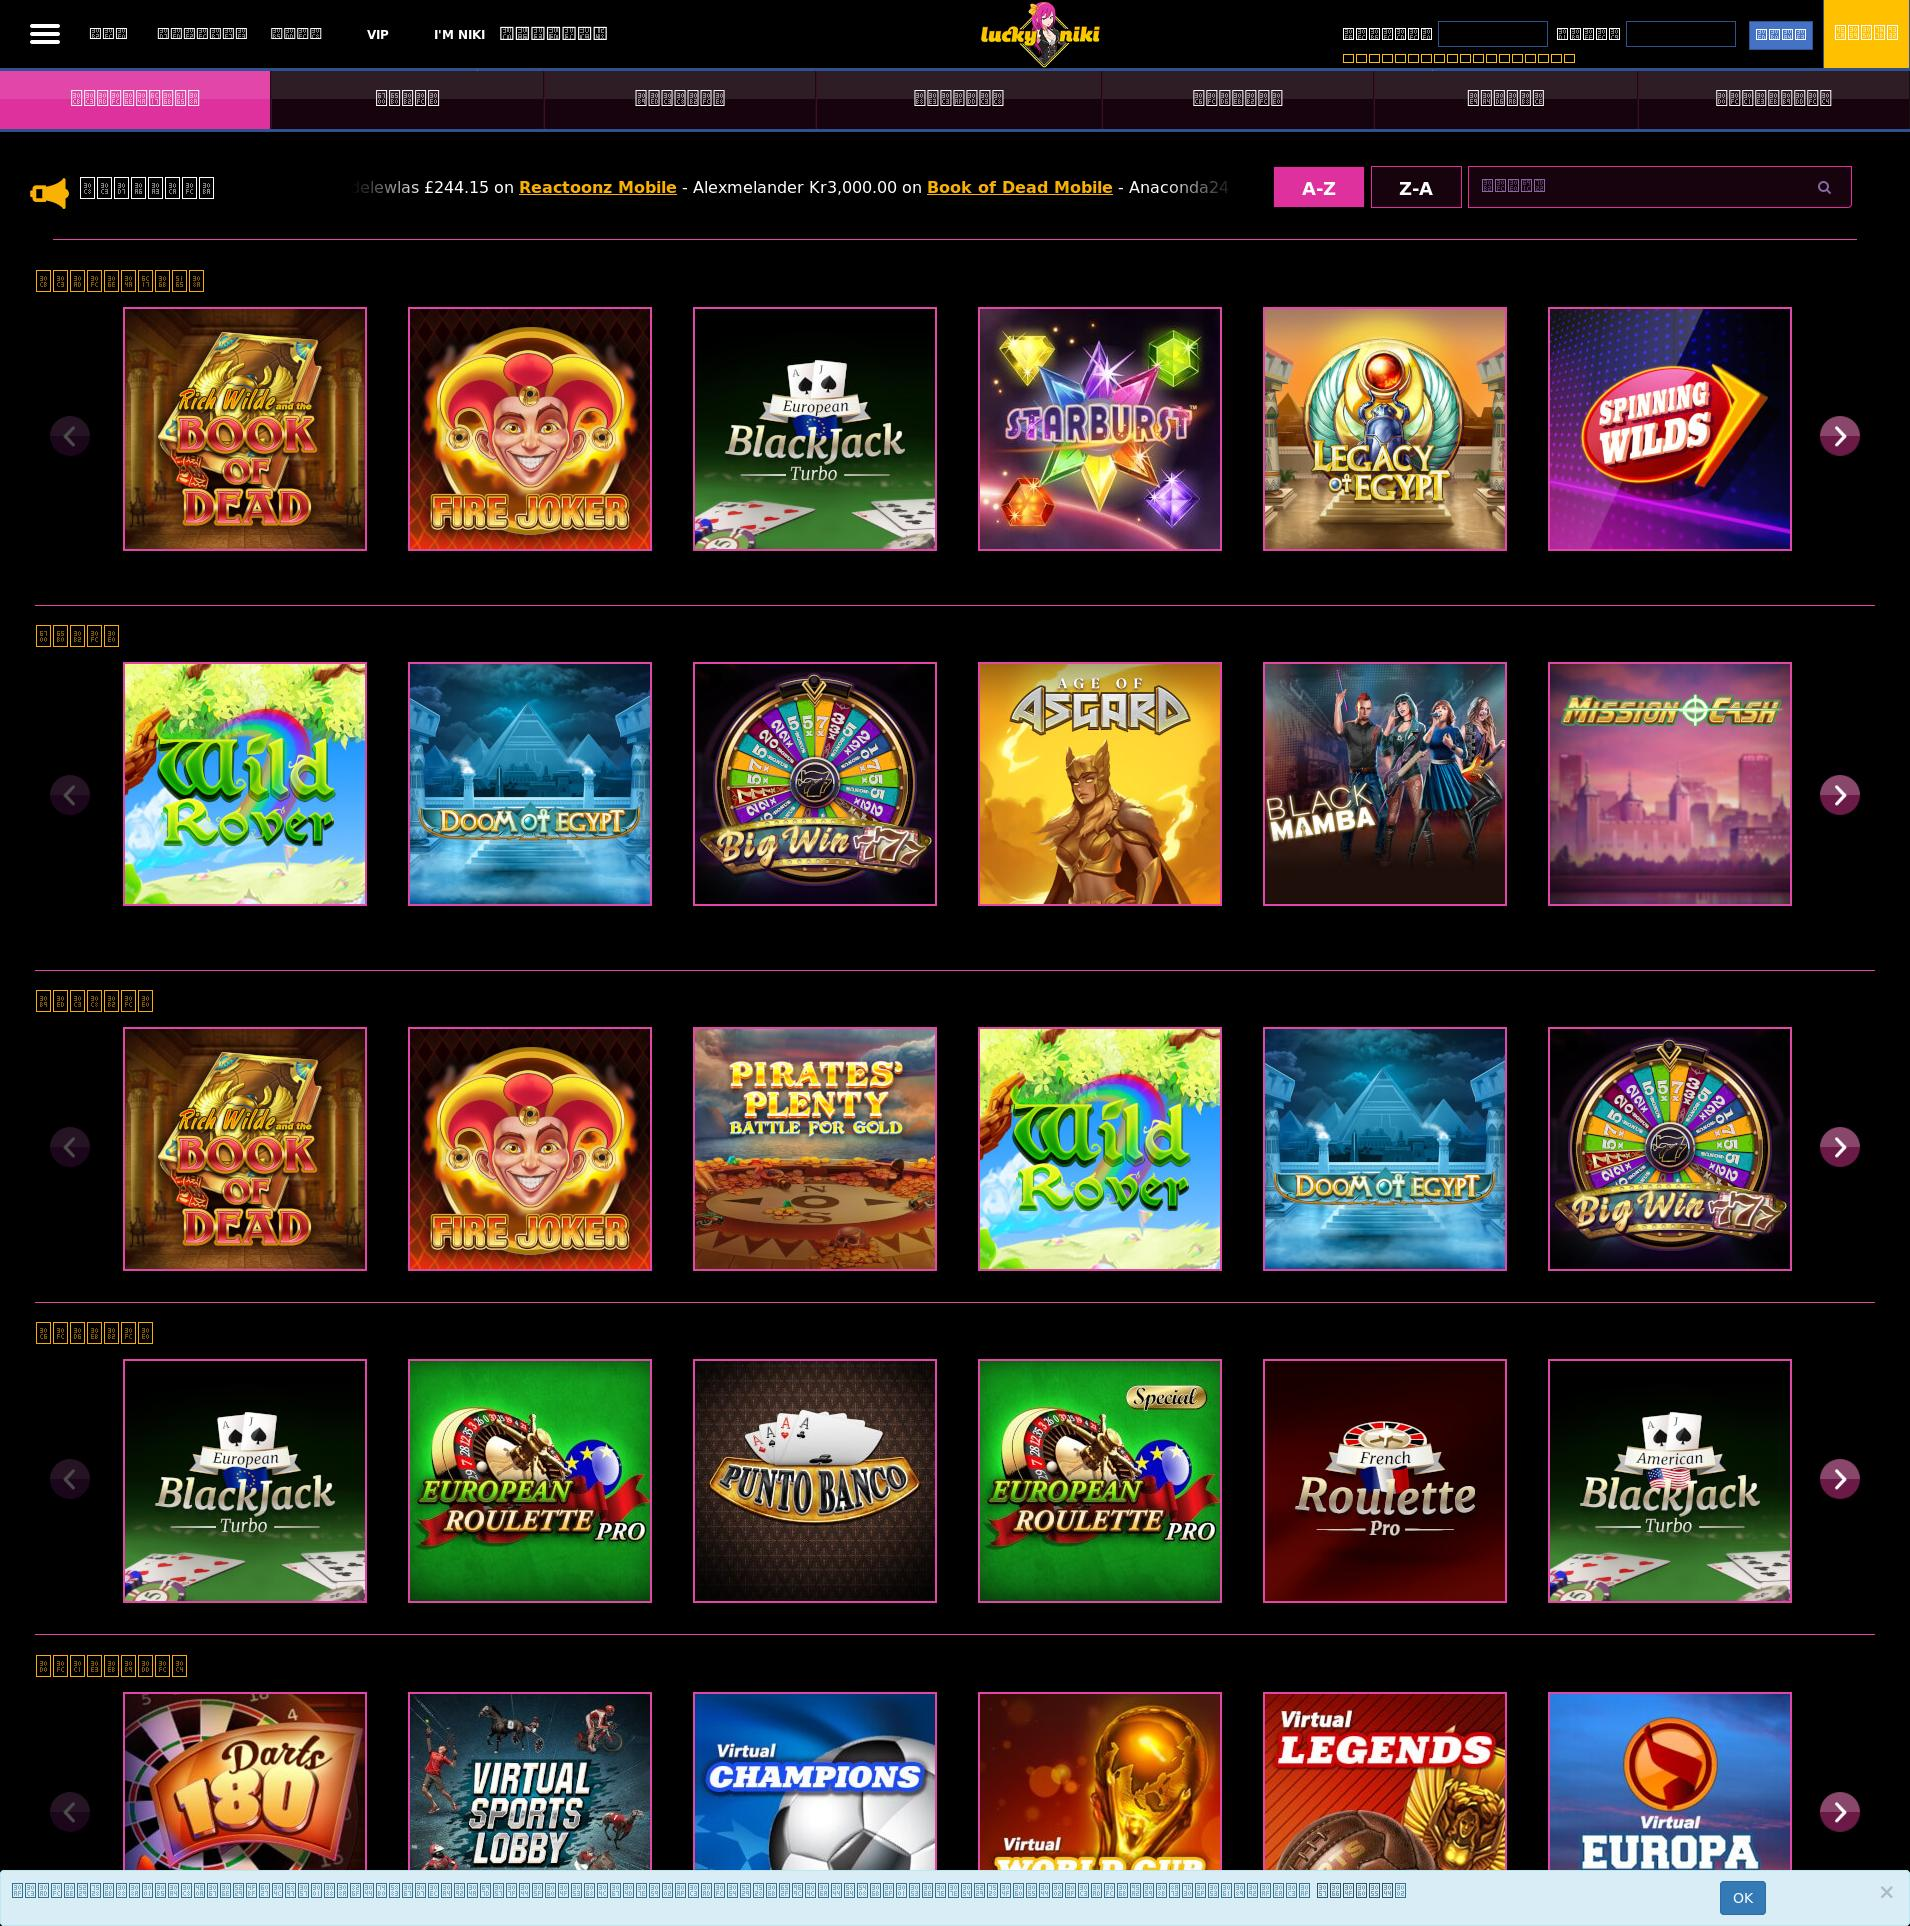 Casino screen Lobby 2019-11-17 for Japan